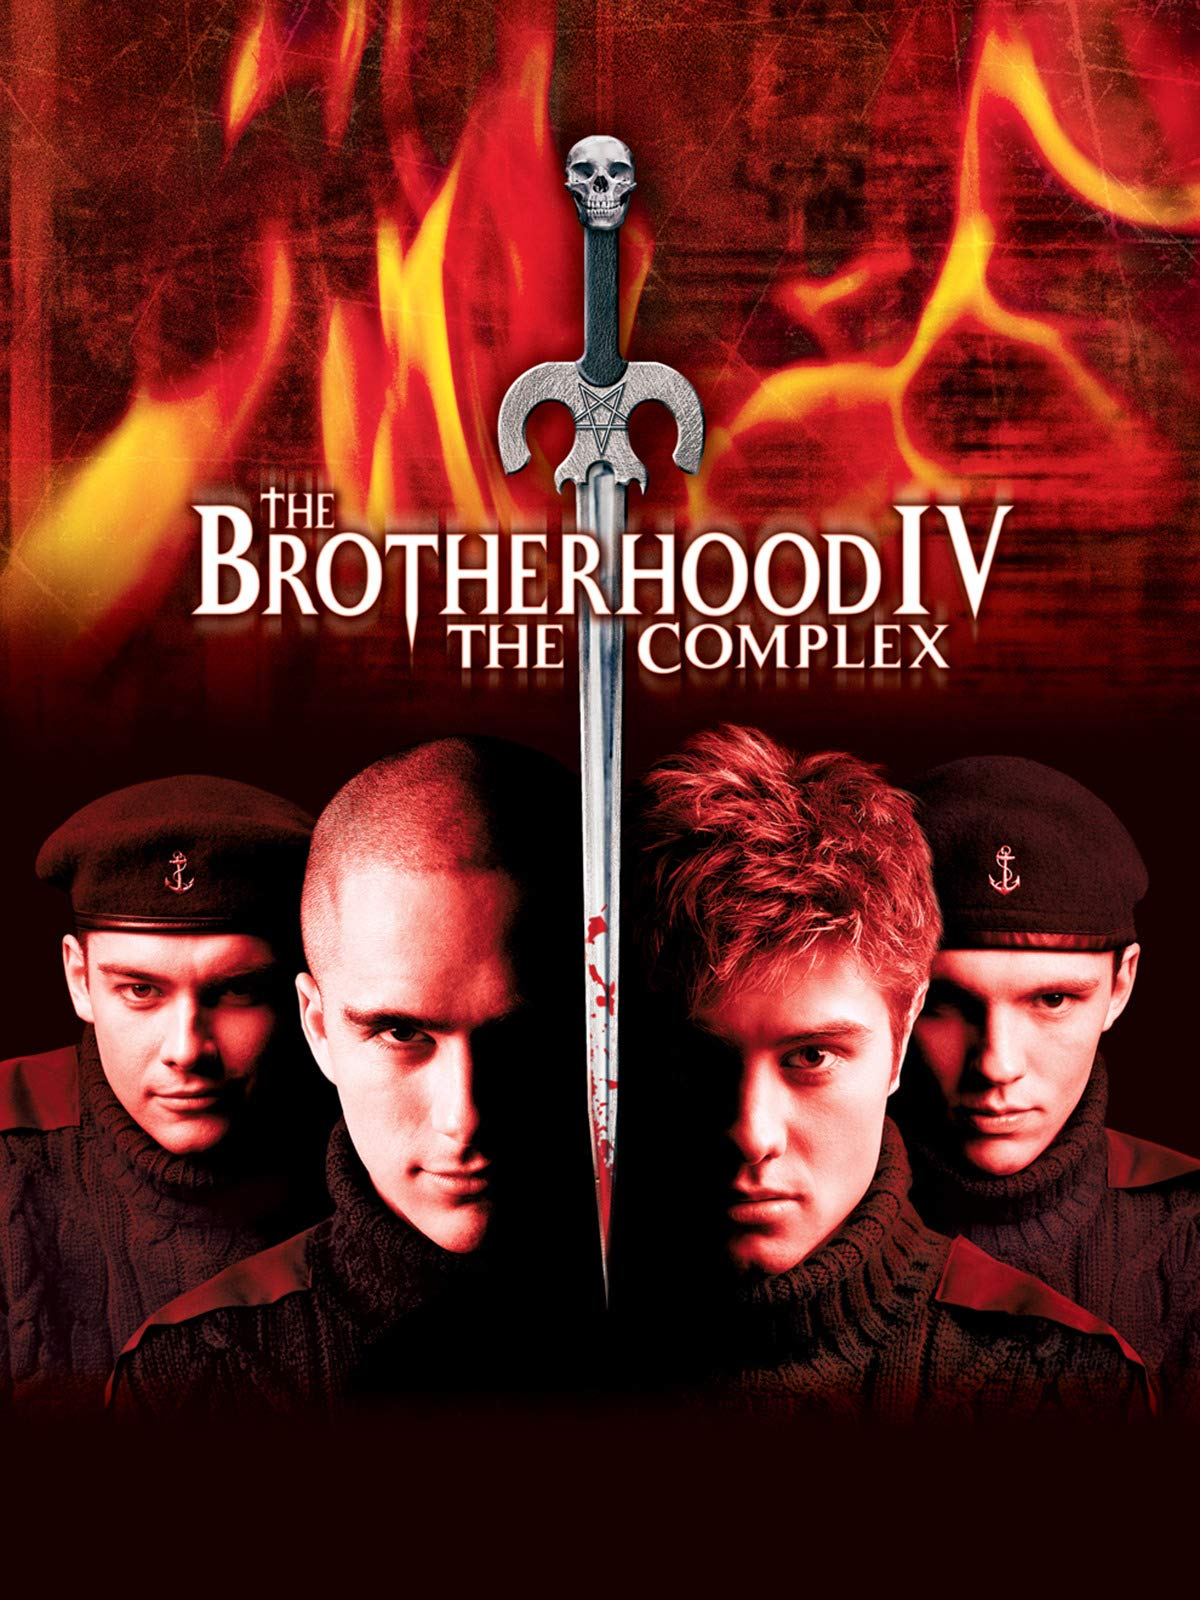 The Brotherhood IV: The Complex on Amazon Prime Video UK